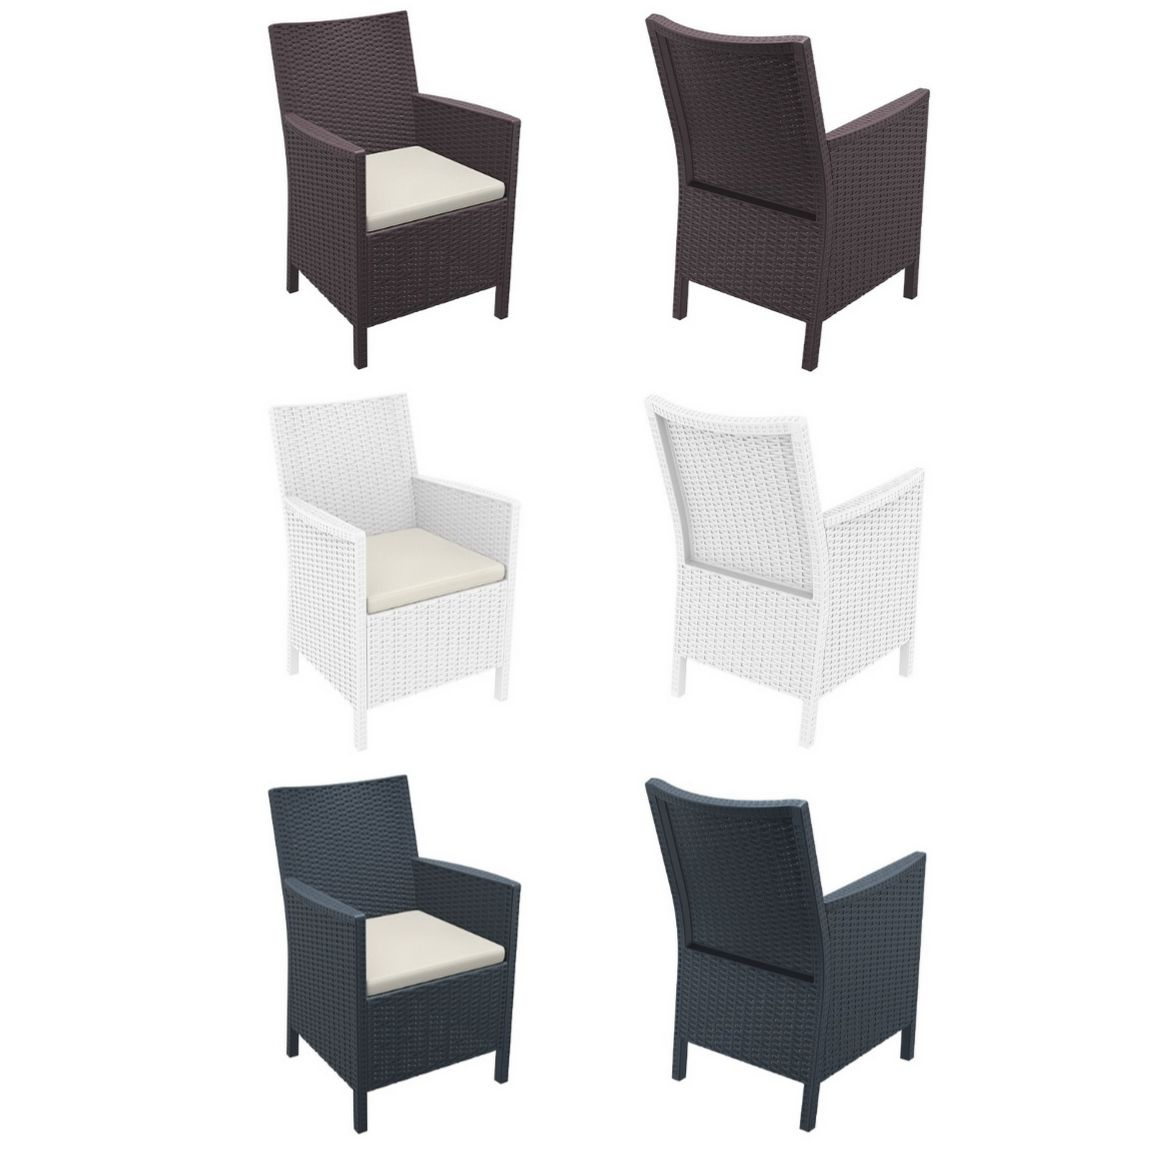 maui-wovenlook-chair-3-colors